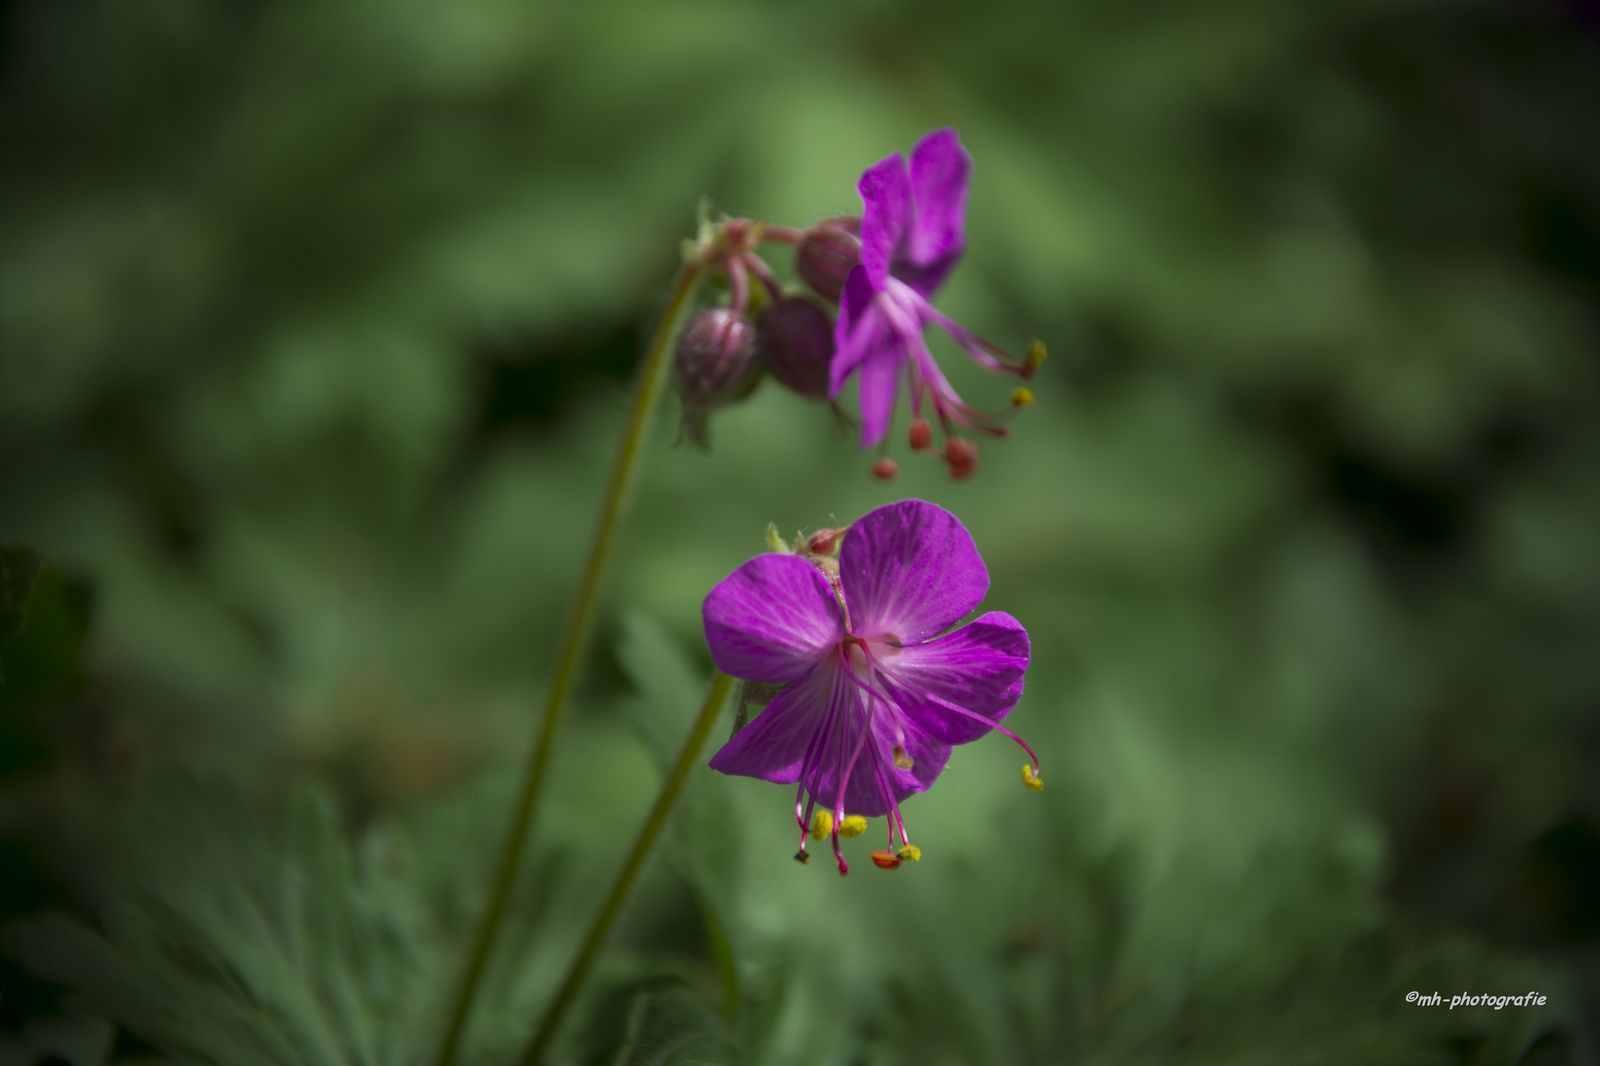 Blumen-DSC_4930-mh-photografie